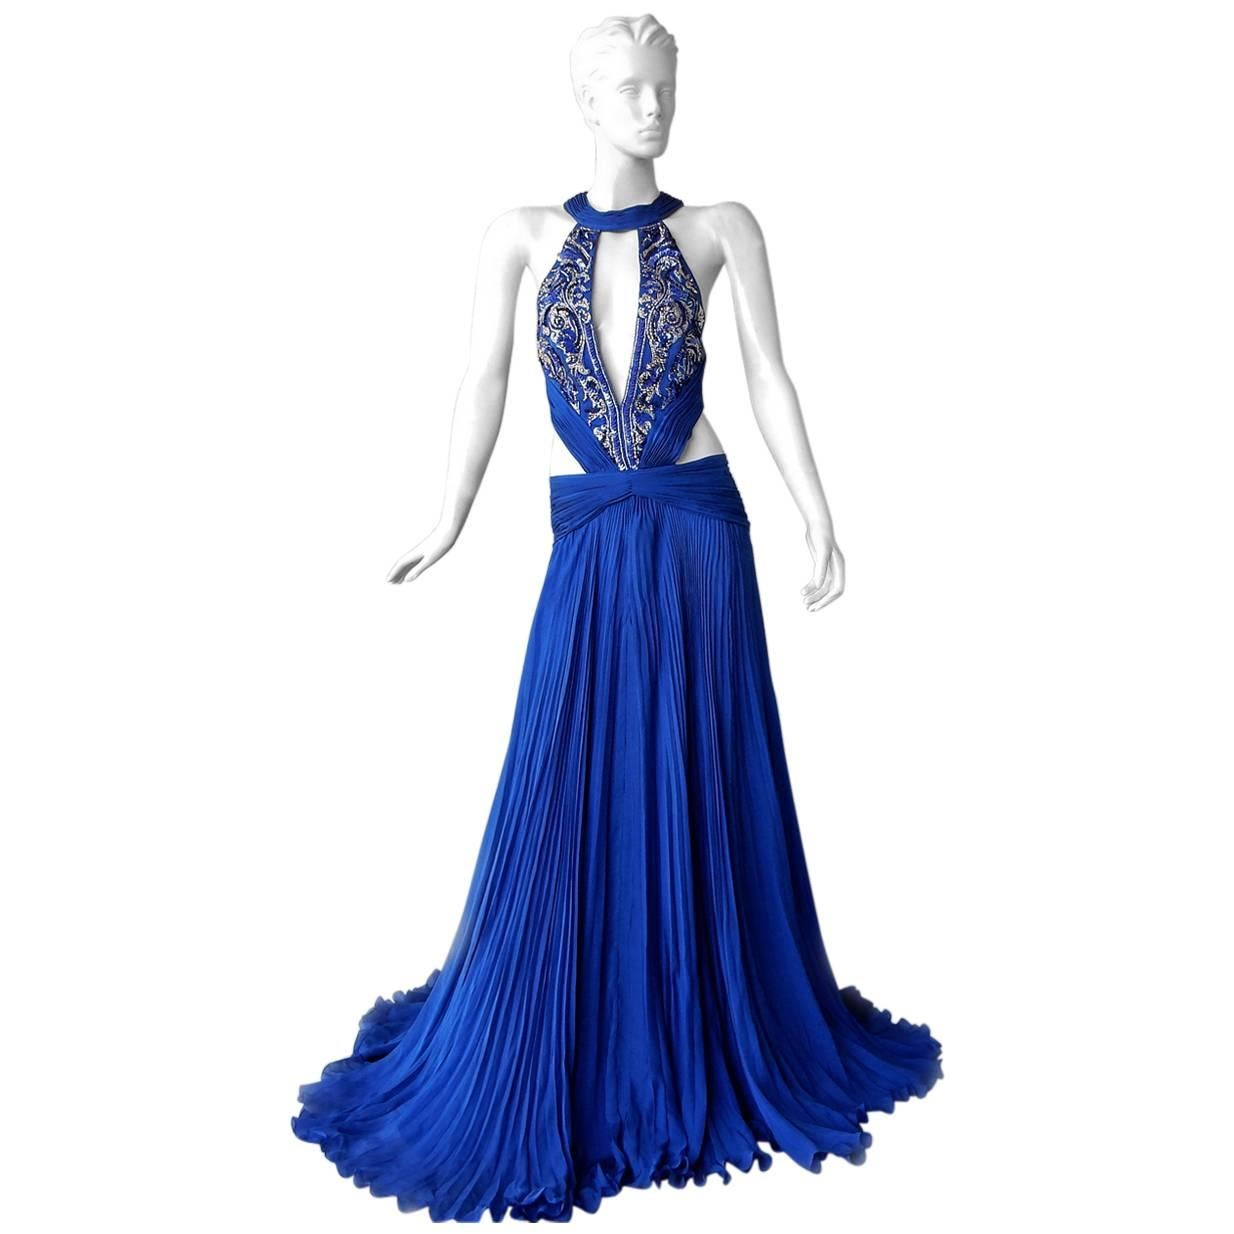 Roberto Cavalli Sapphire Blue Red Carpet Goddess Gown  New!